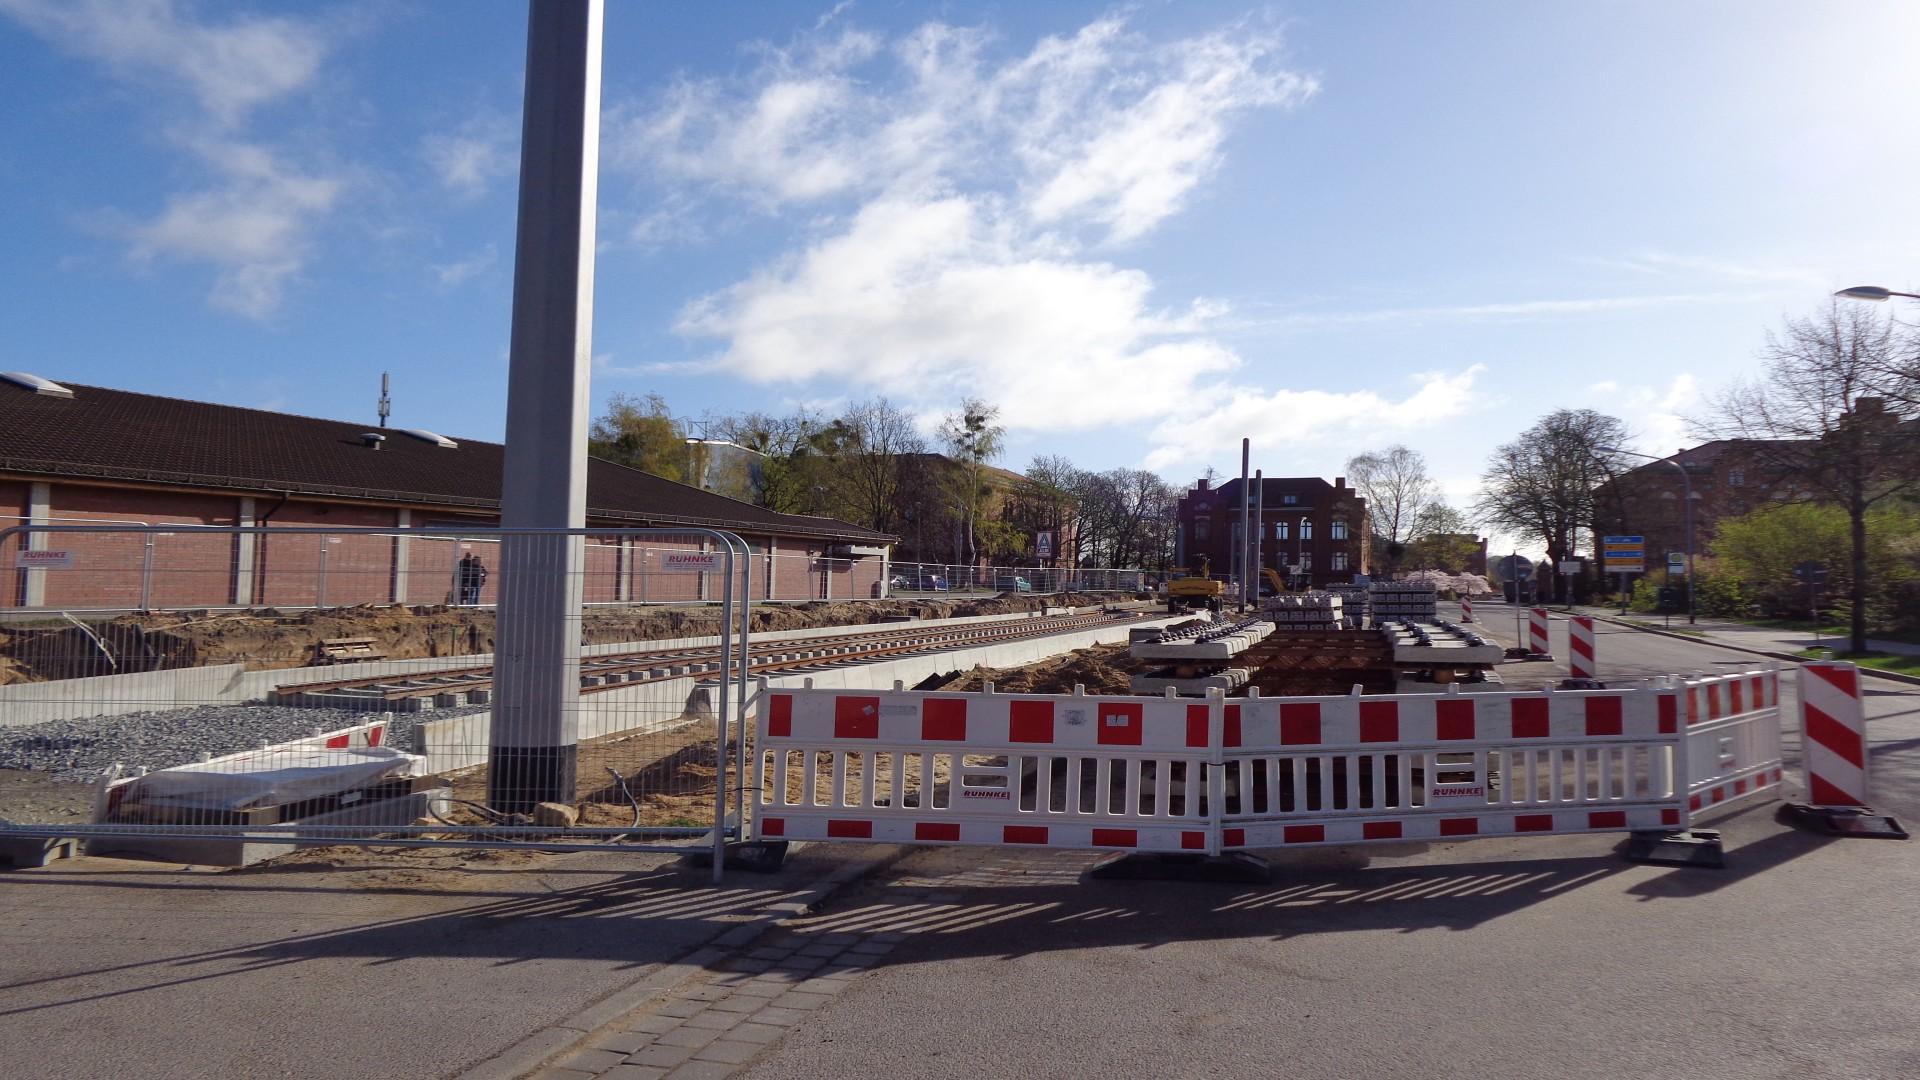 Straßenbahntrasse Georg Hermann Allee/Bereich Rote Kaserne 4